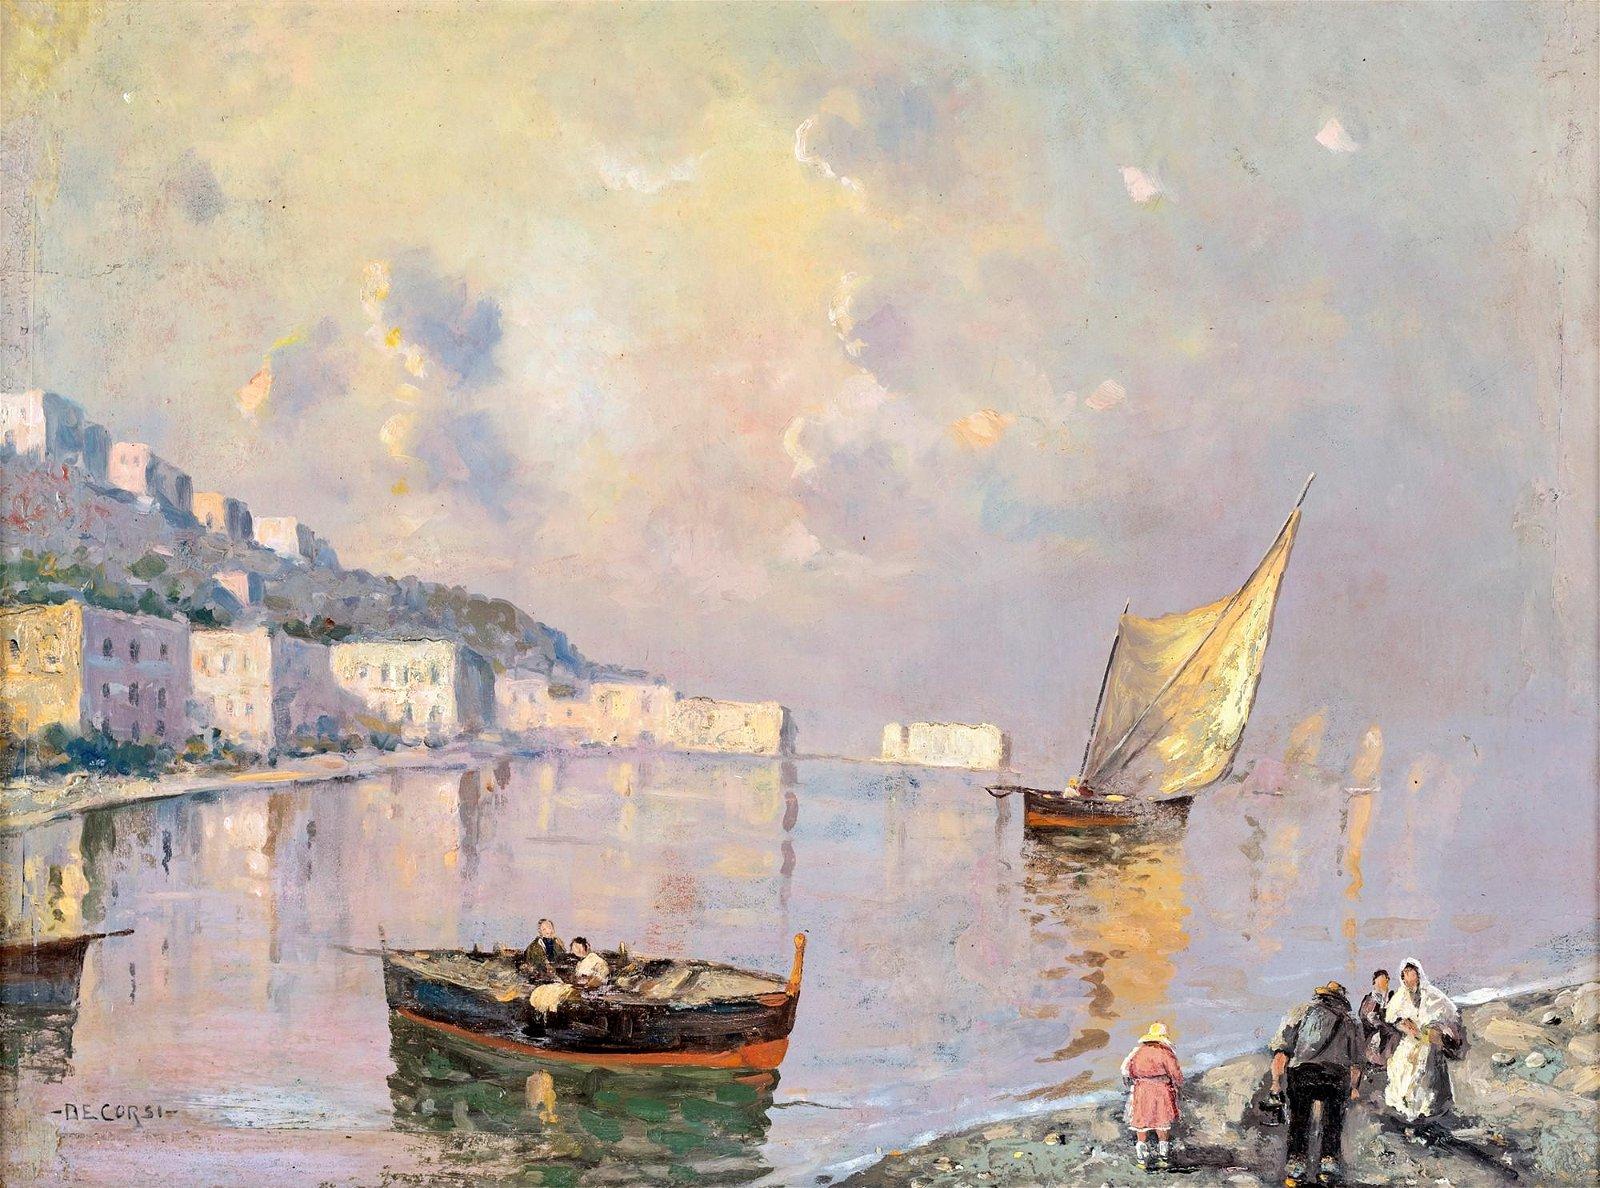 Nicolas De Corsi (Odessa 1882-Torre Del Greco 1956)